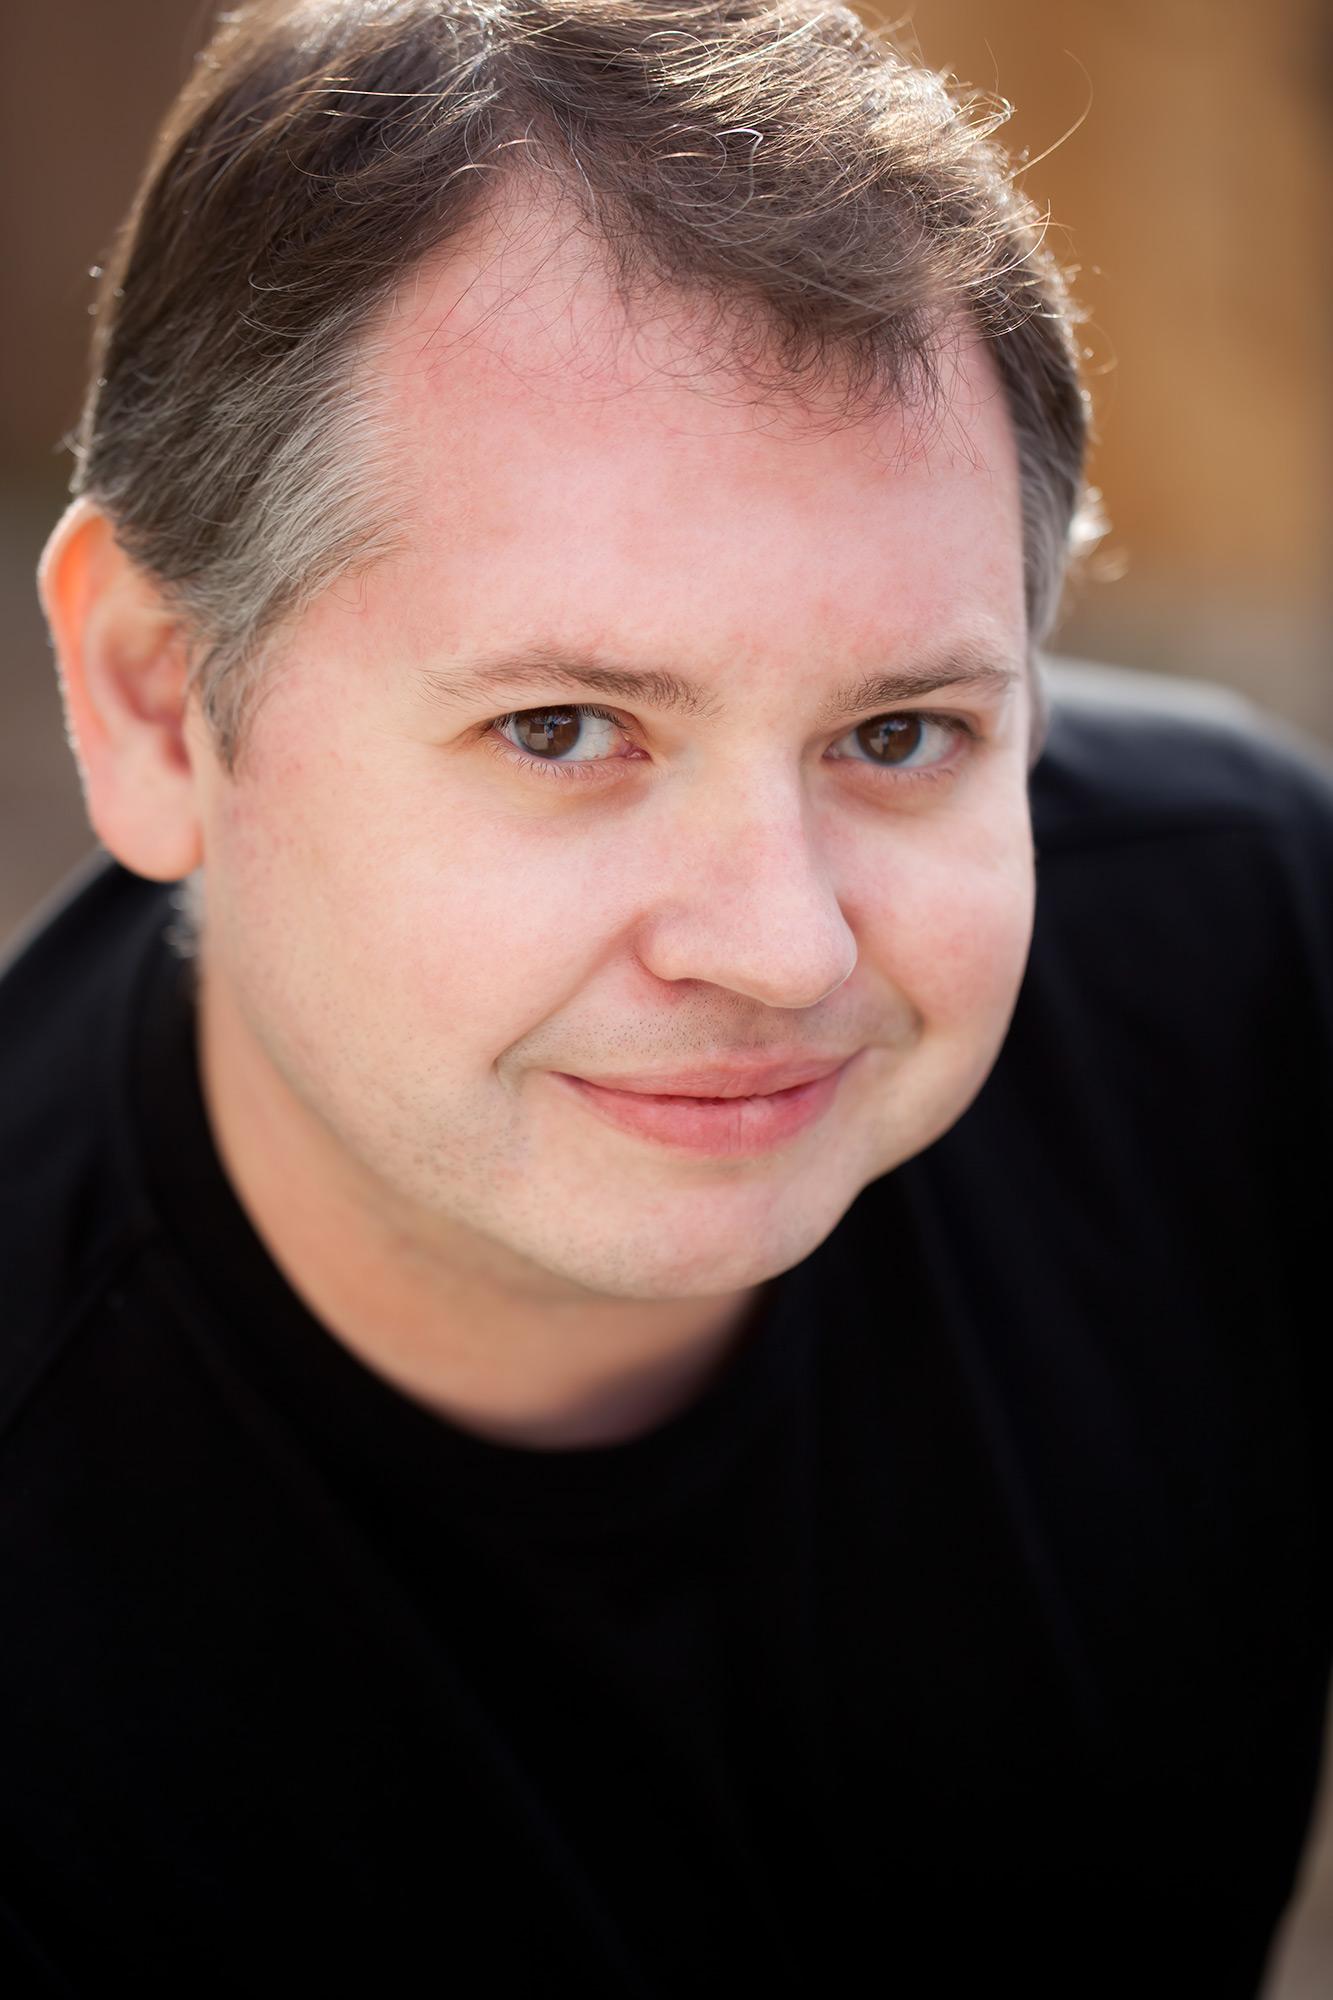 Jason DeFillippo - Wild Business Growth Podcast #139: Award-Winning Podcast Producer, Tim Ferriss and Jordan Harbinger